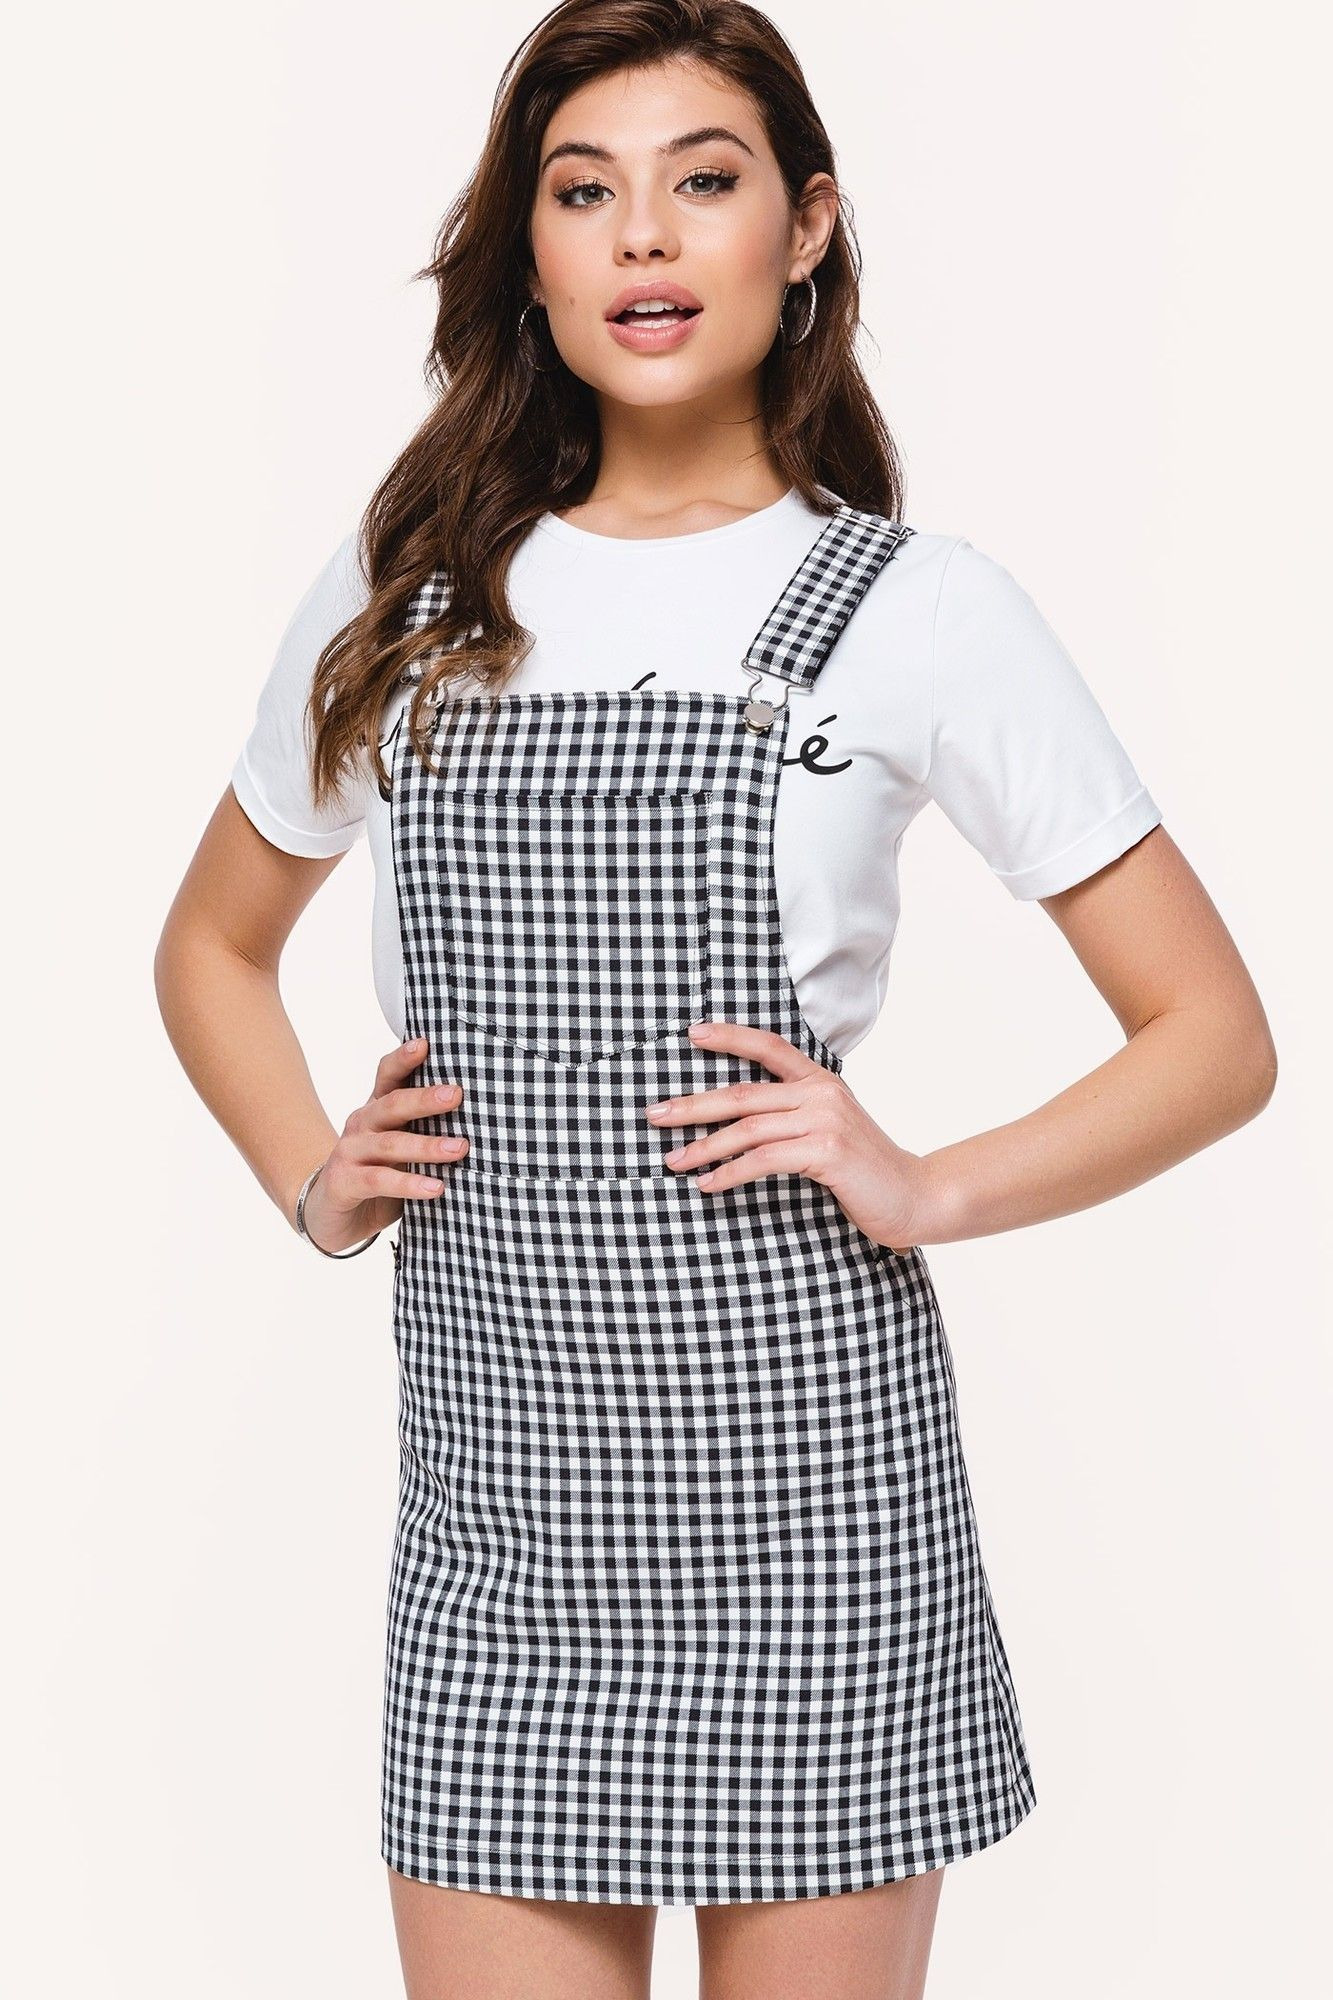 24b6b17a11 Loavies checkered dungaree dress